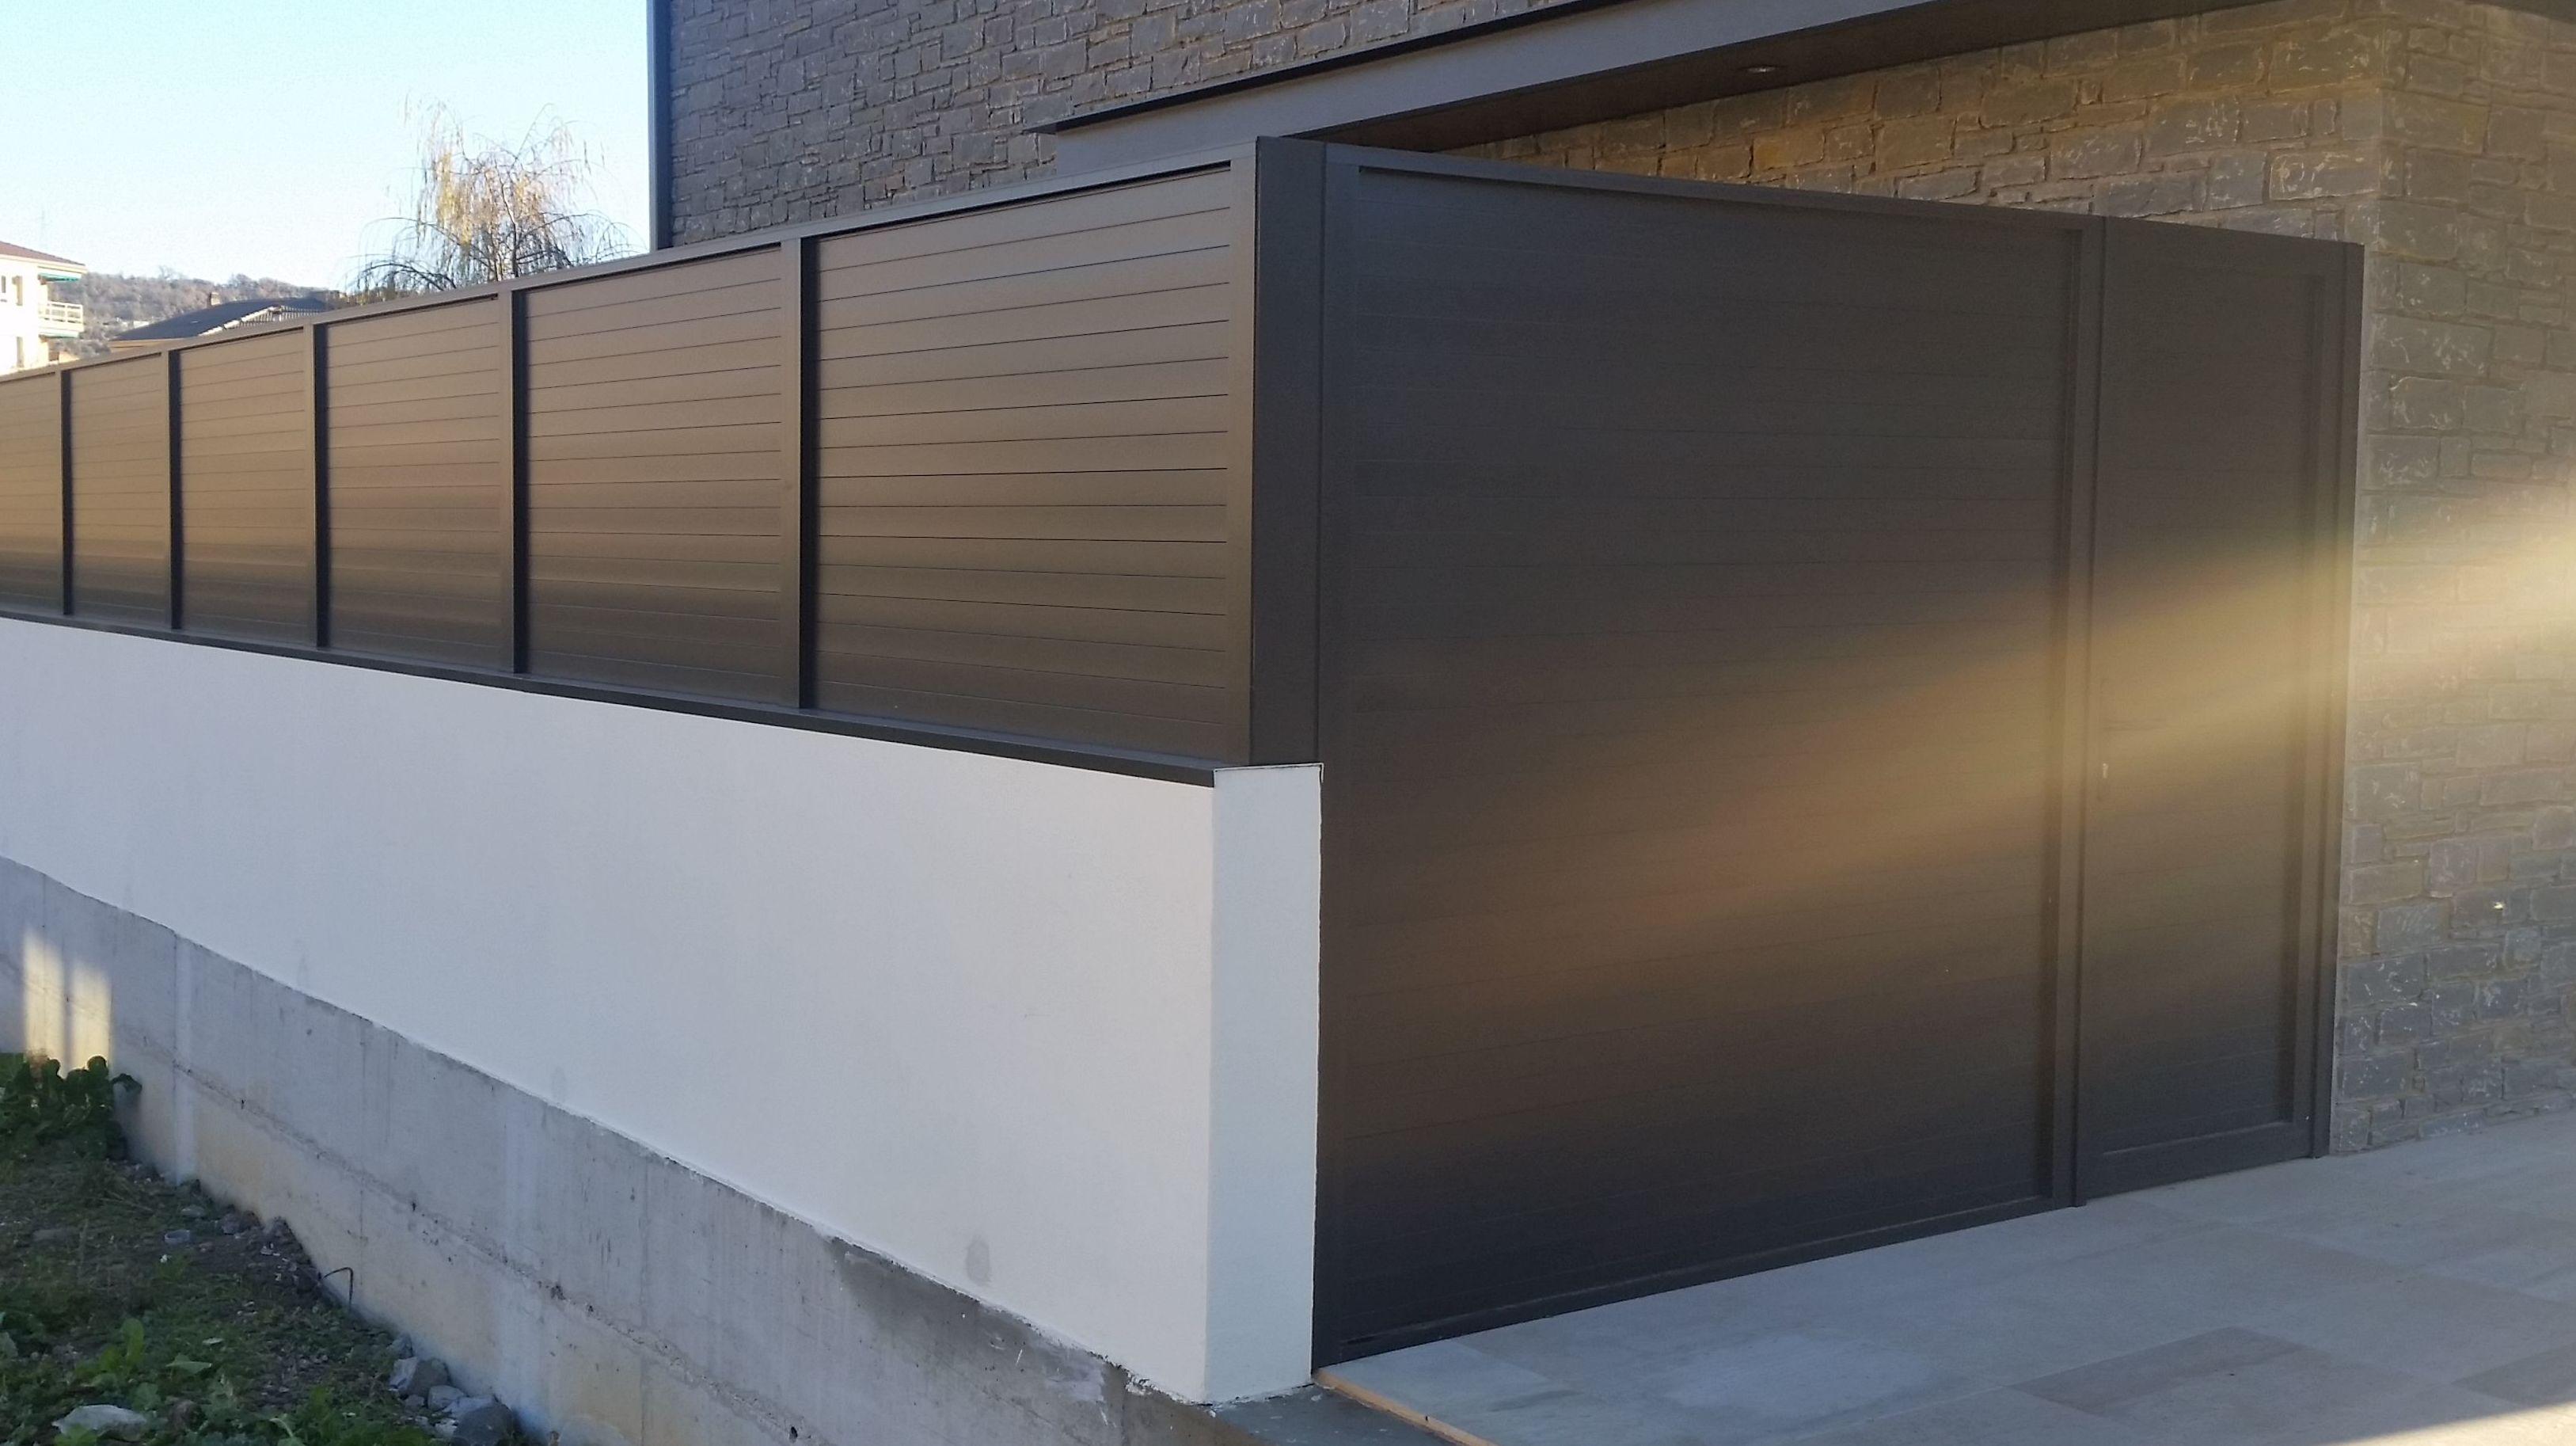 Foto 6 de Carpintería de aluminio, metálica y PVC en Calafell | Aluminis Solé